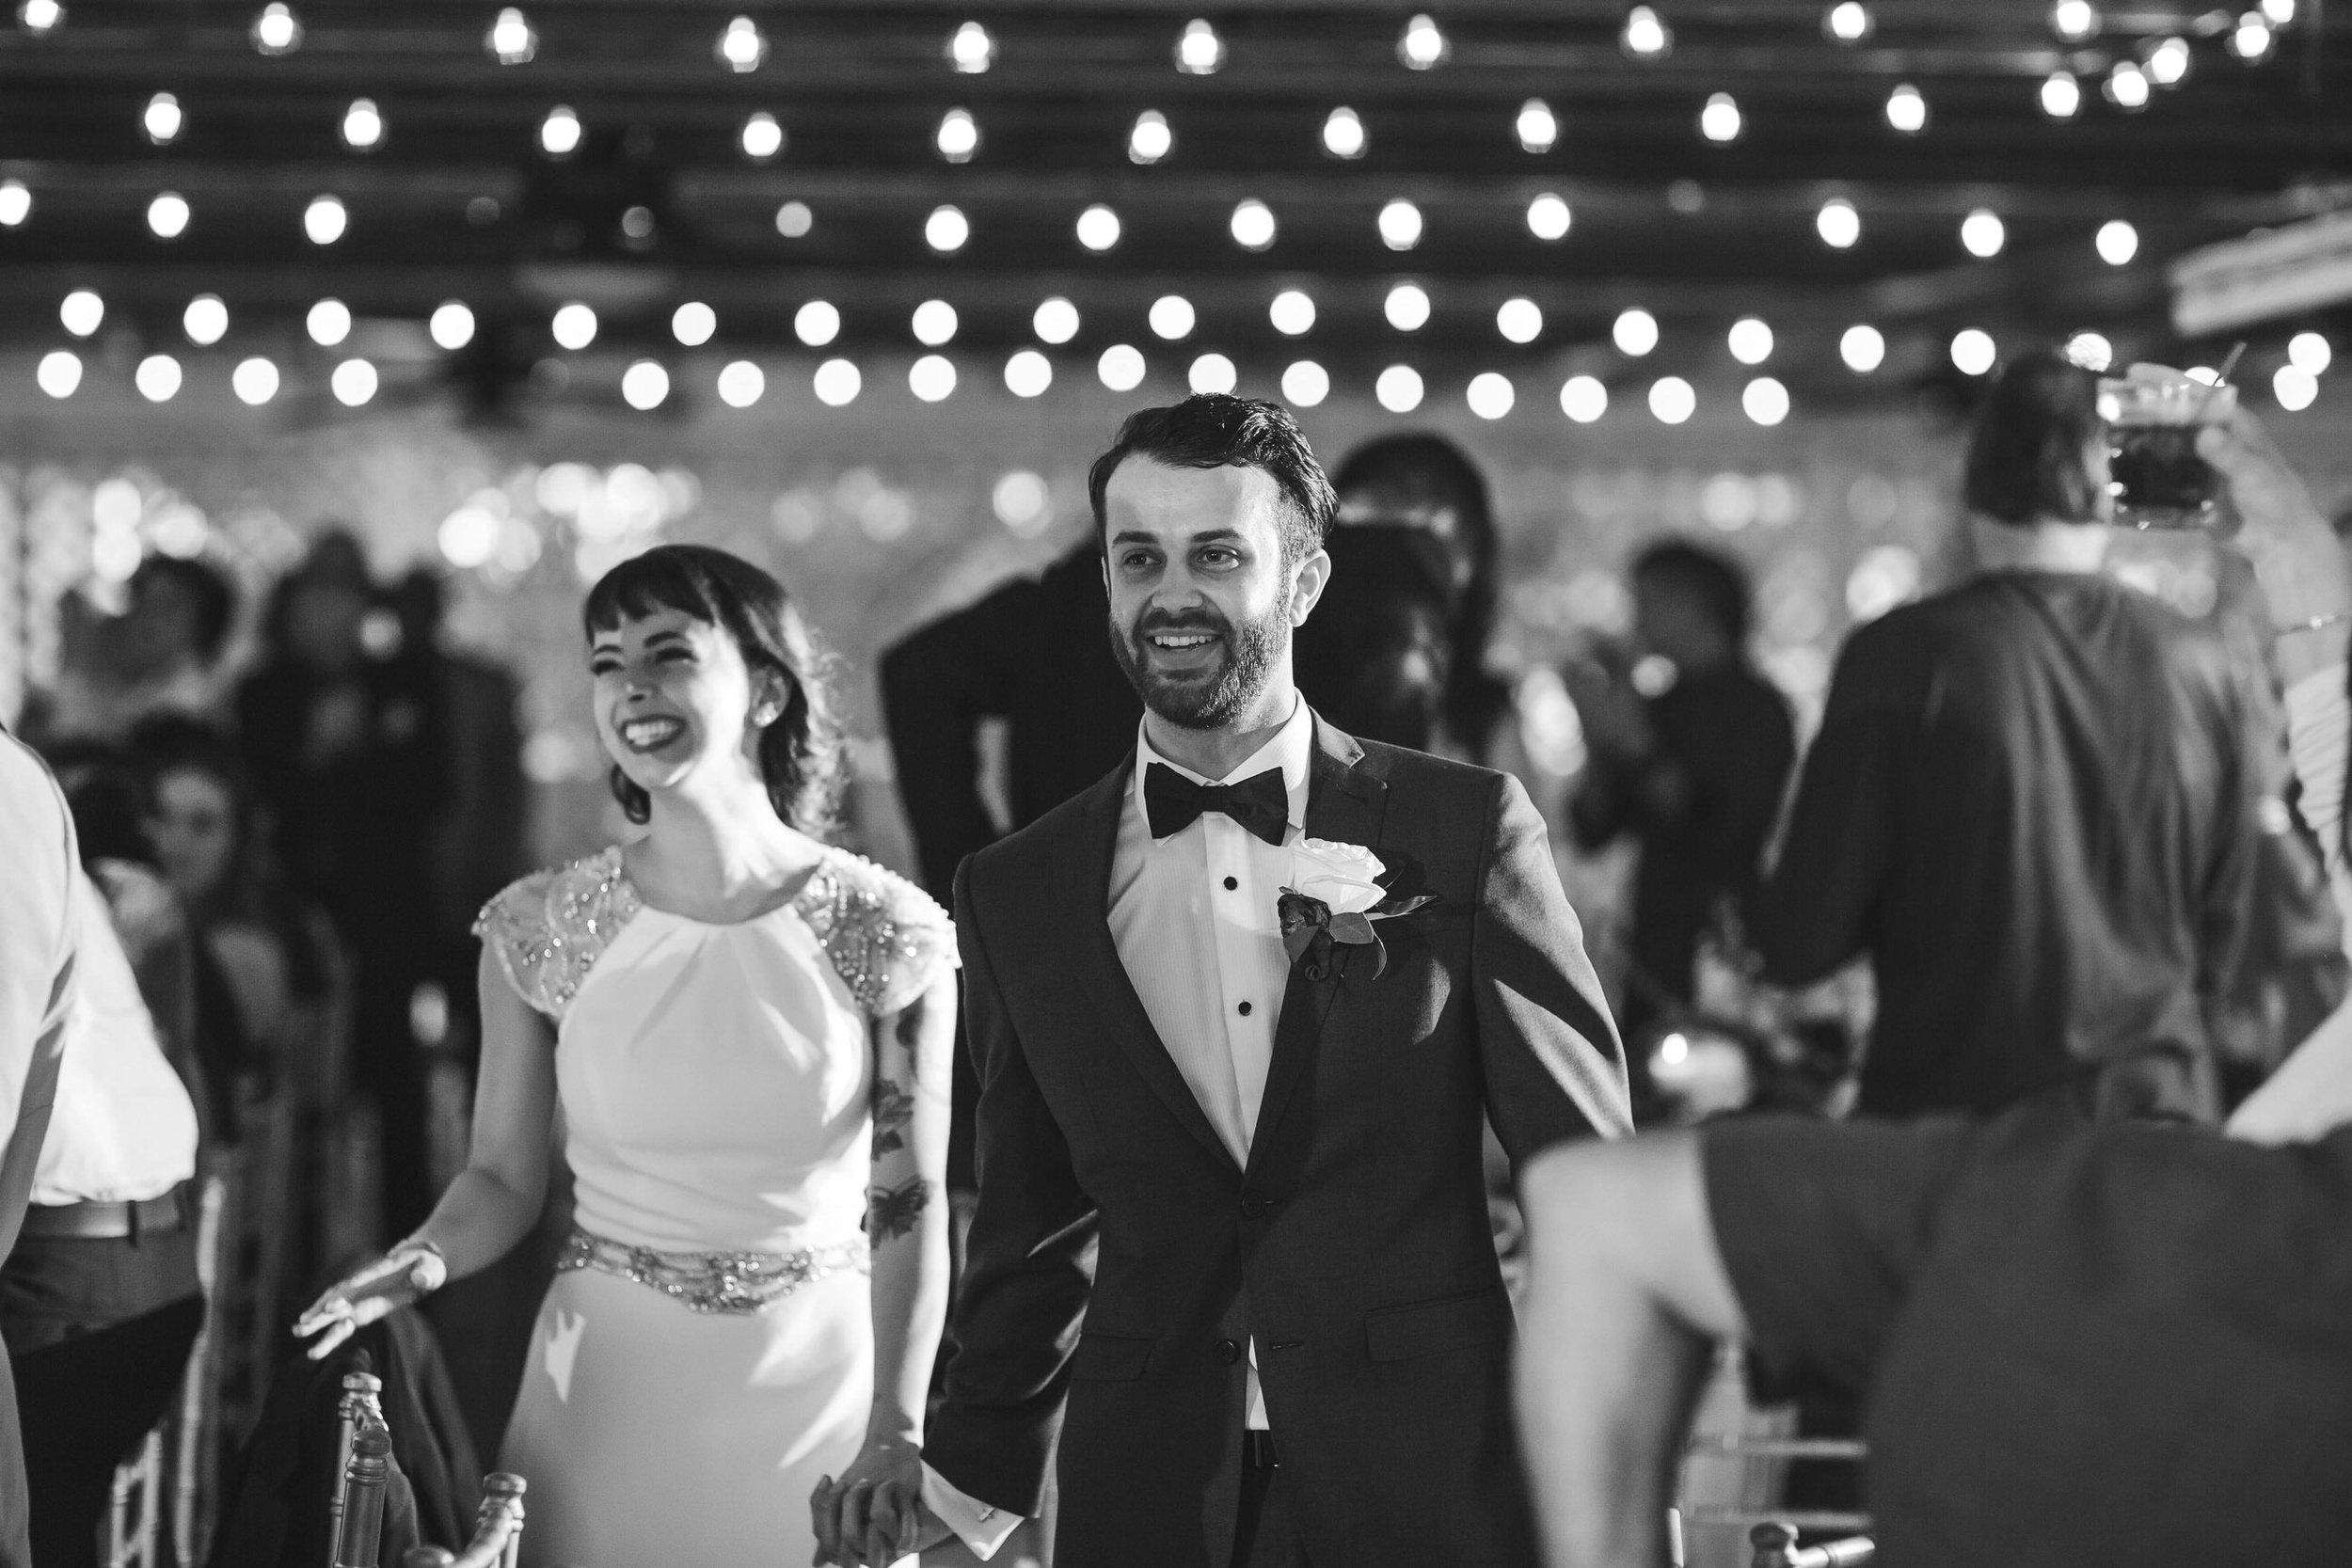 bride-groom-moment-black-and-white-entrance-love-amazing-tiny-house-photo.jpg